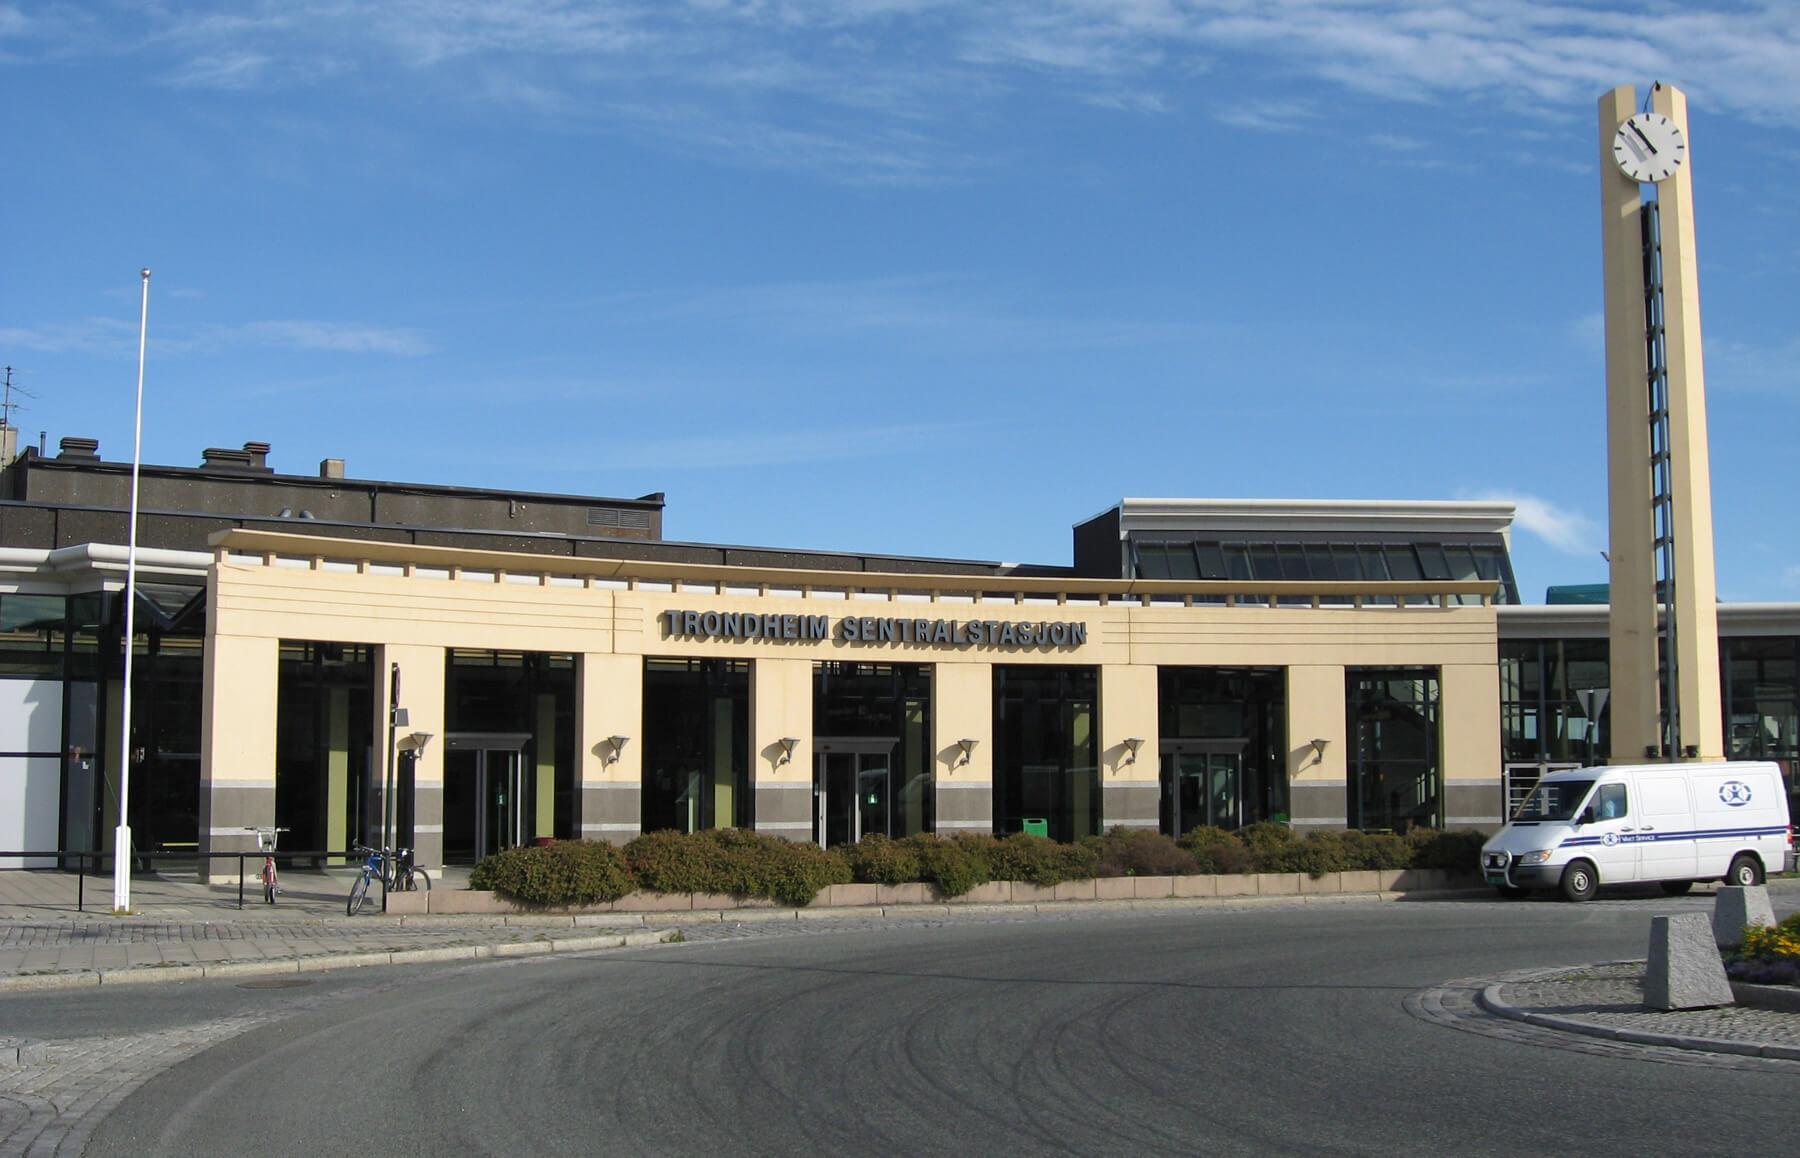 Центральный ЖД вокзал Тронхейма